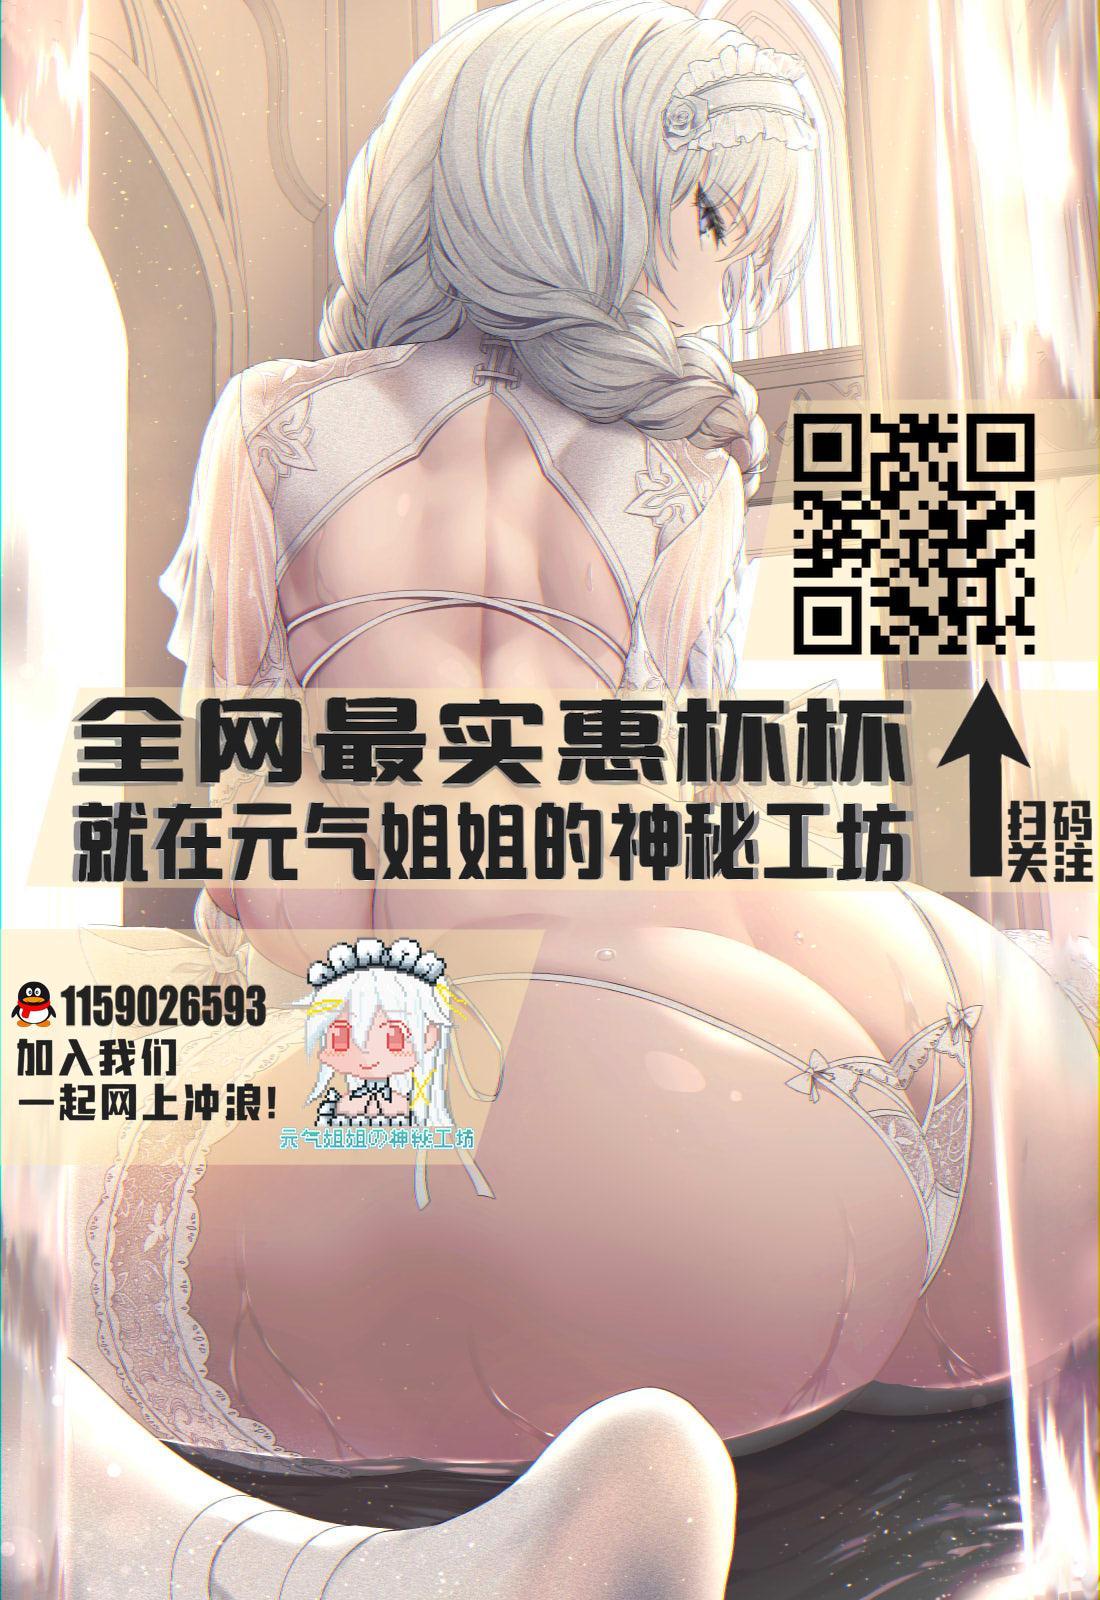 (COMITIA127) [Manpuchi (Nekodel)] Uro -Makuai- Kanwa [Chinese] [零食汉化组] 42